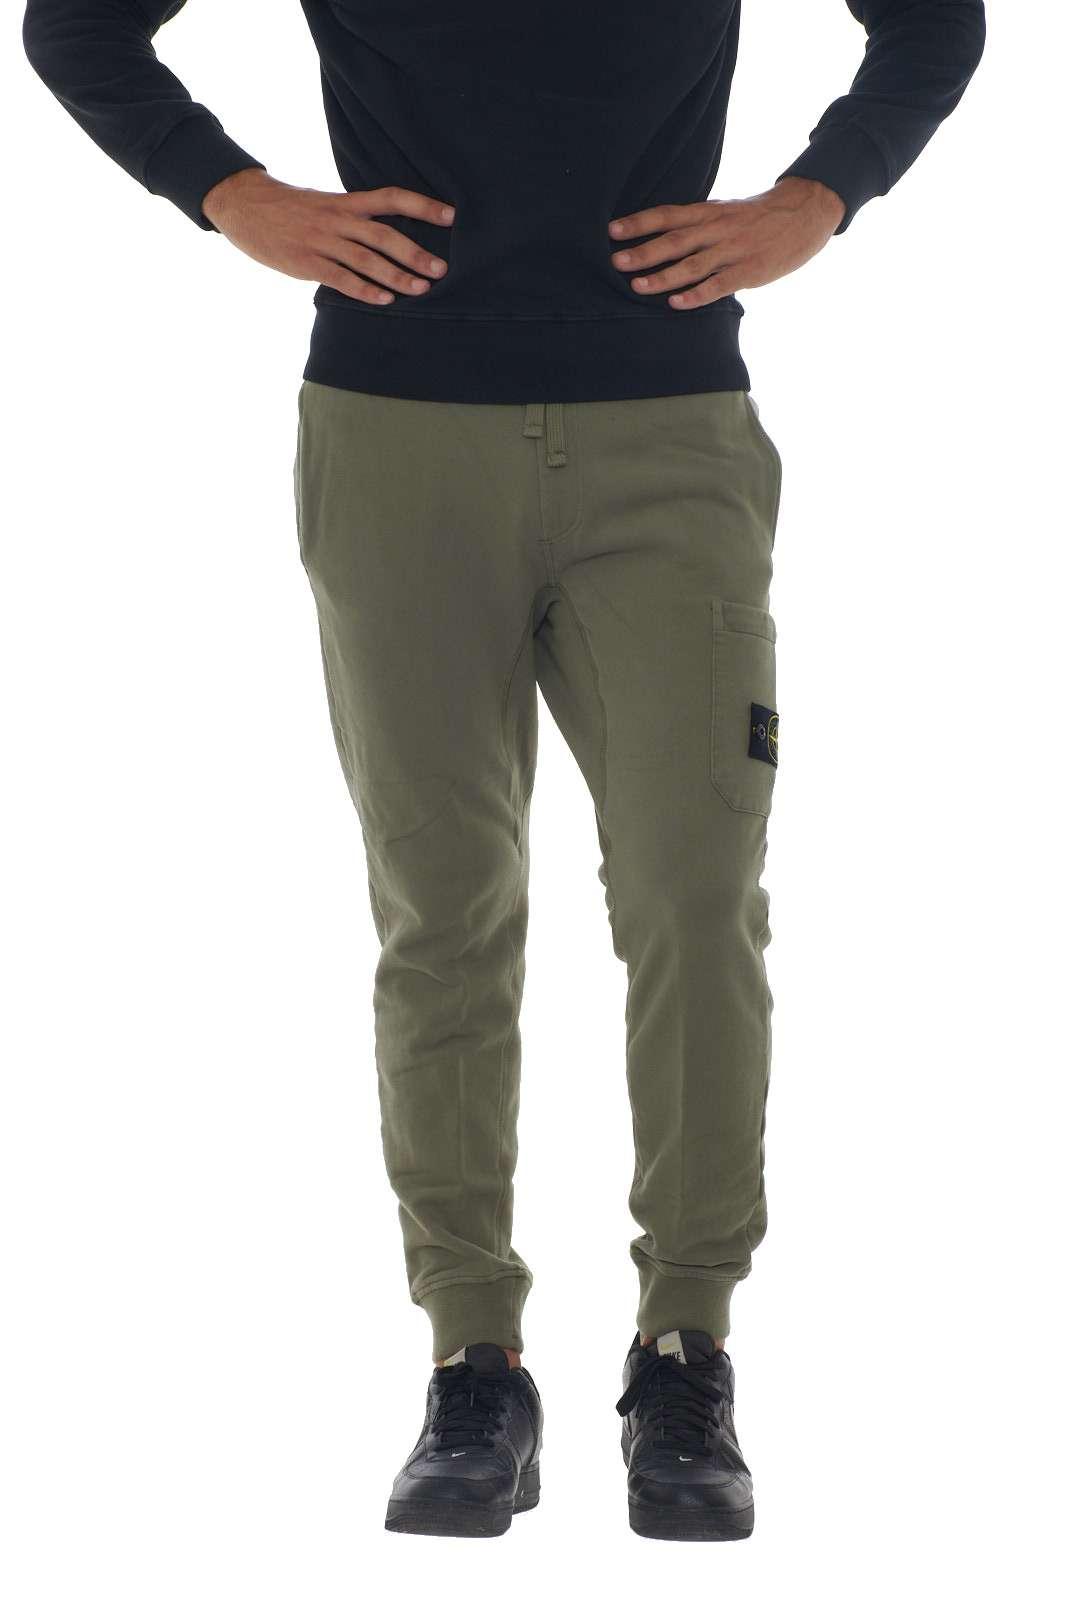 https://www.parmax.com/media/catalog/product/a/i/AI-outlet_parmax-pantaloni-uomo-Stone-Island-711560320-A.jpg